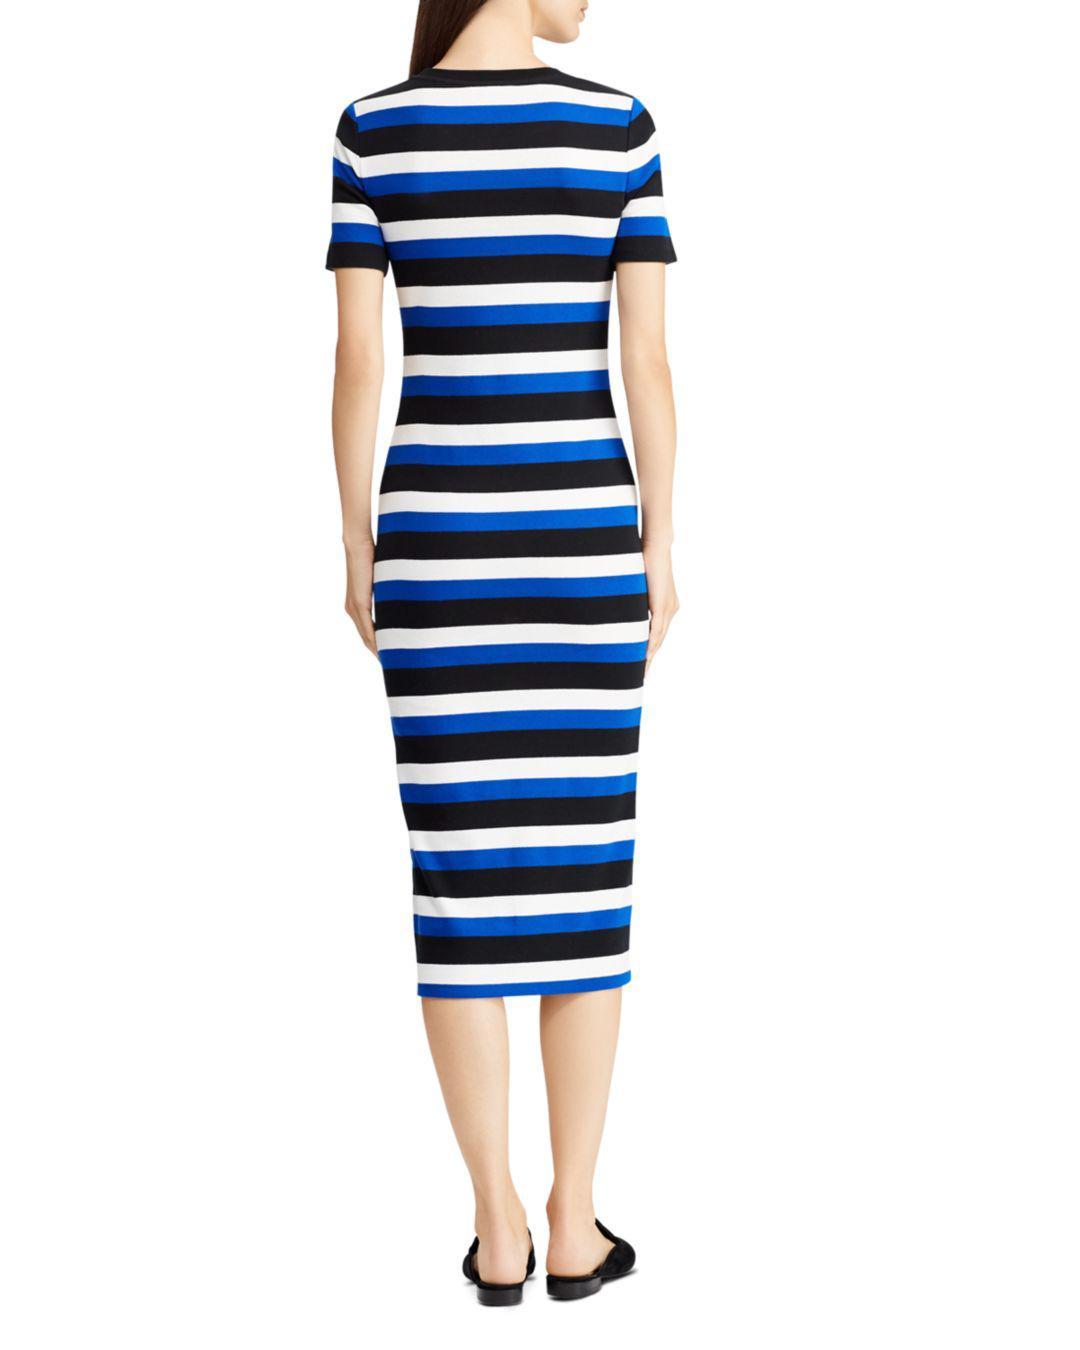 b47dc746fa0 Lyst - Ralph Lauren Lauren Stripe Midi Dress in Black